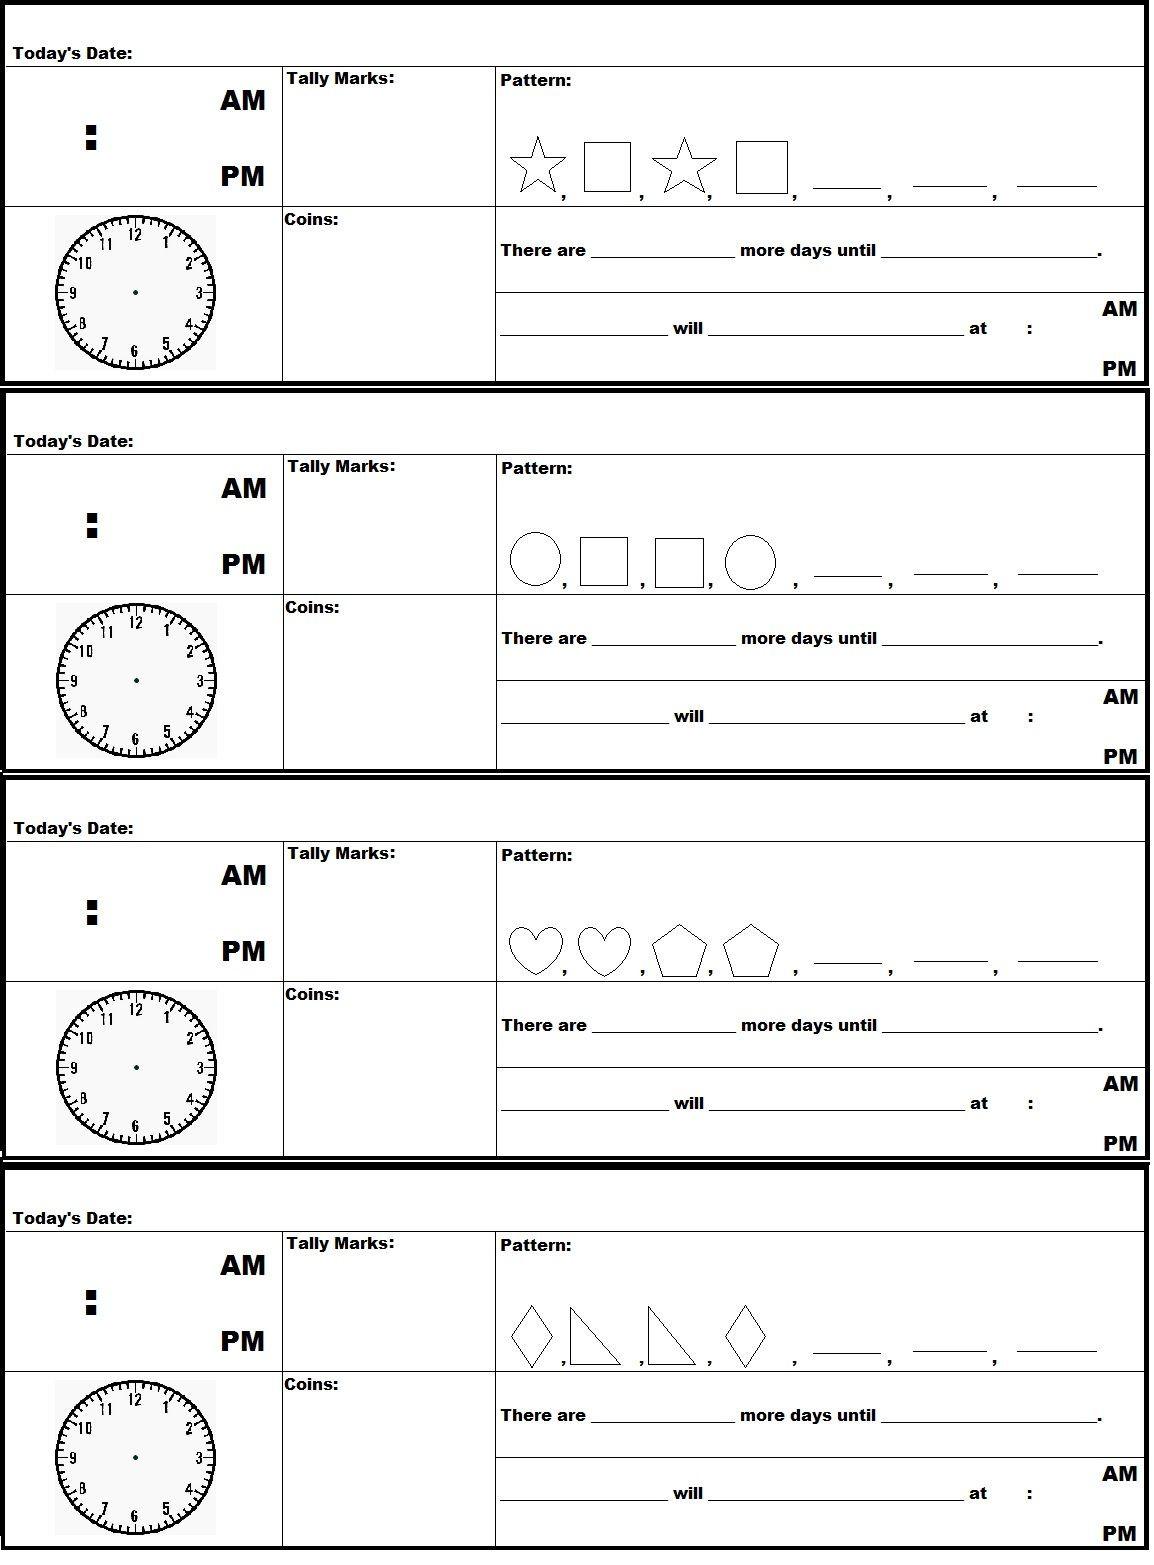 Saxon Math Grade 3 Worksheets A Free Printable Document Of Saxon Math 2nd Grade Meeting